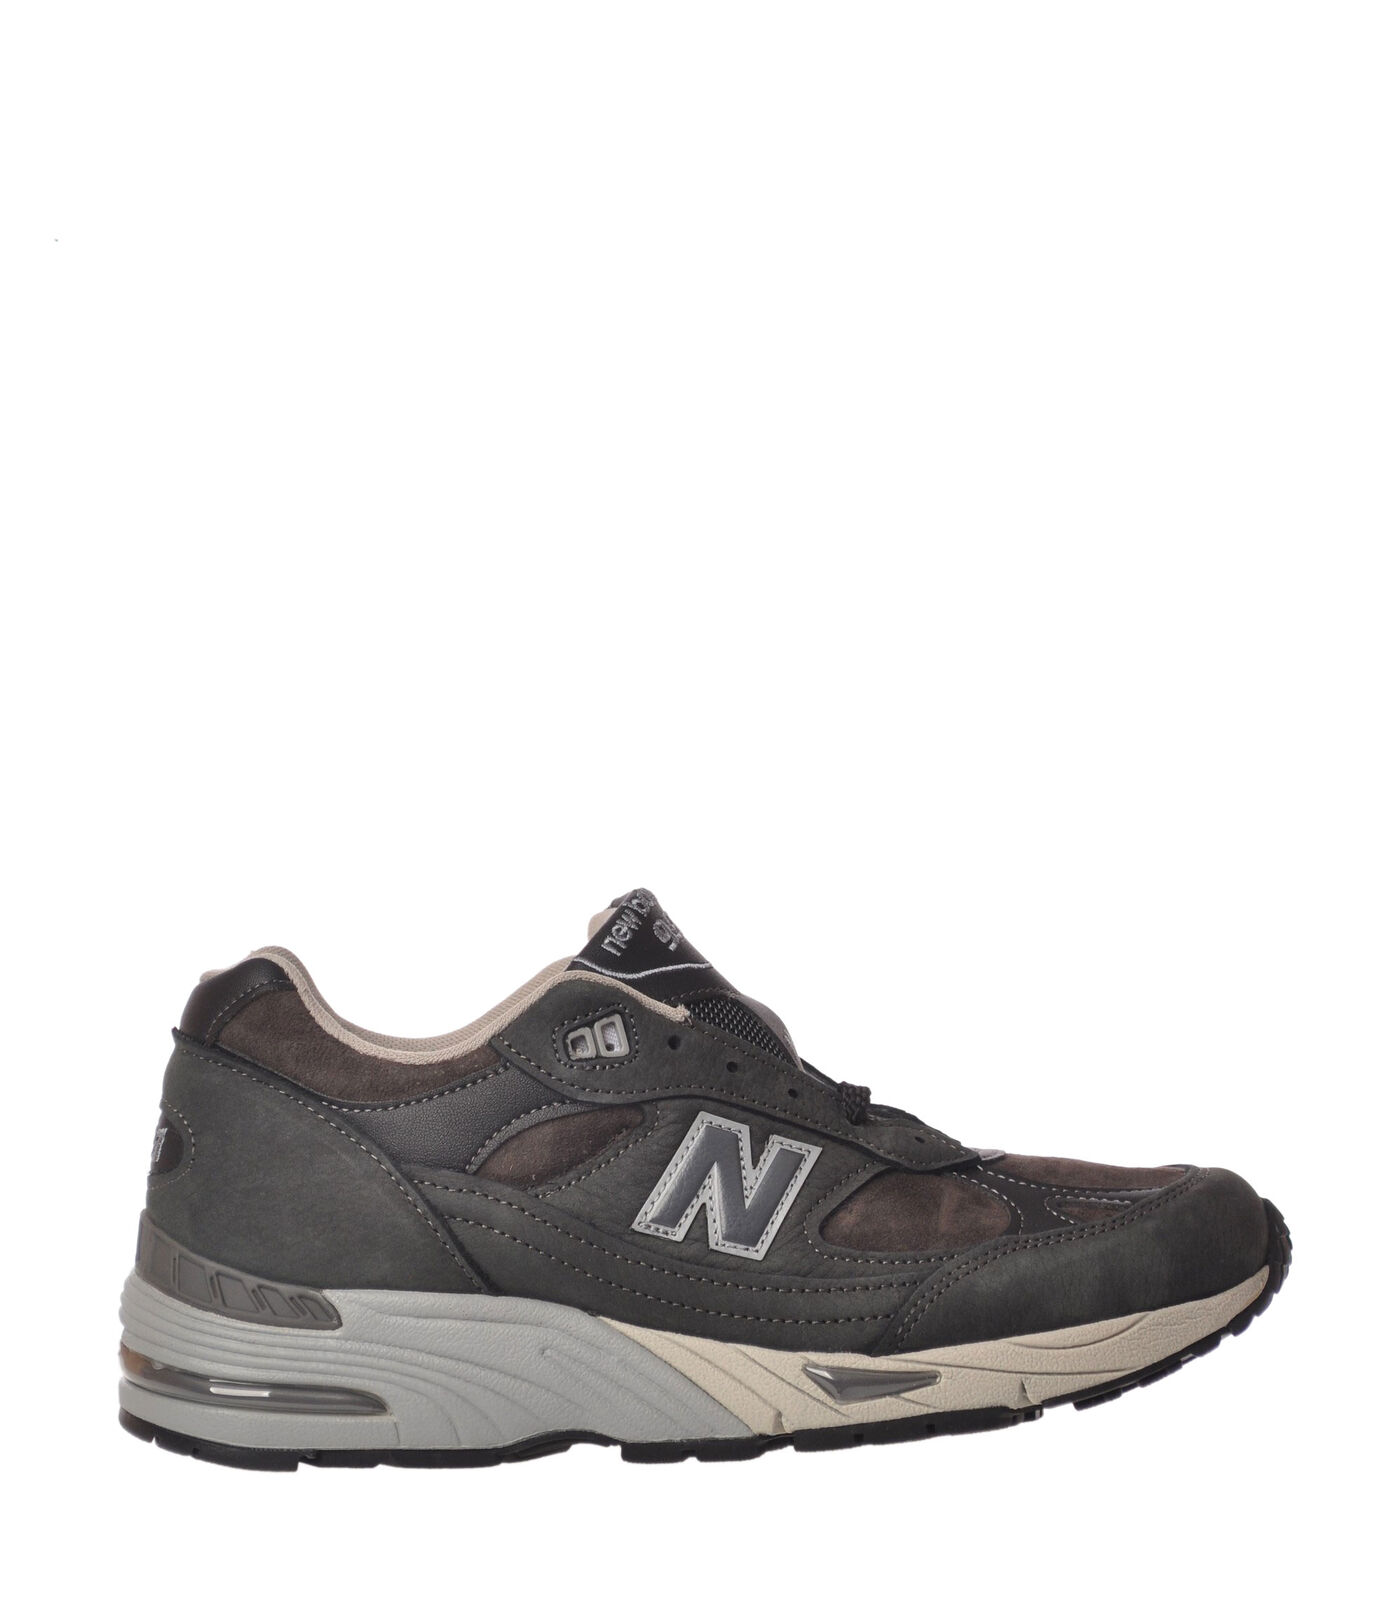 New New New Balance-Zapatos-con cordones-Man-gris - 4031526I183916  precios razonables